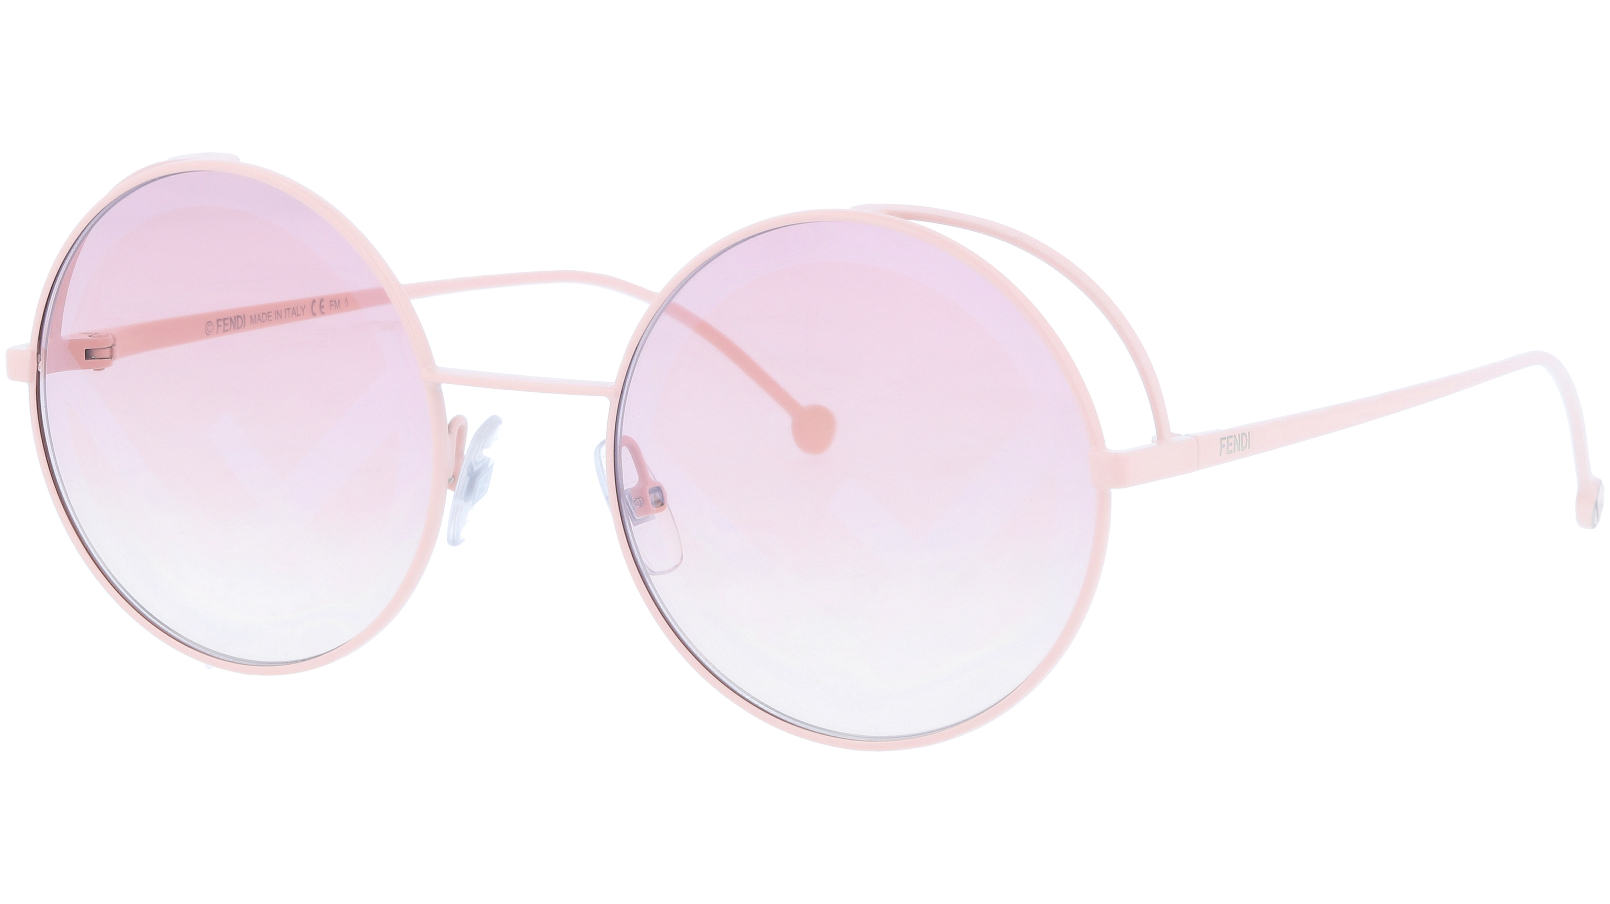 FENDI FF0343/S 35J01 53 Pink Round Sunglasses